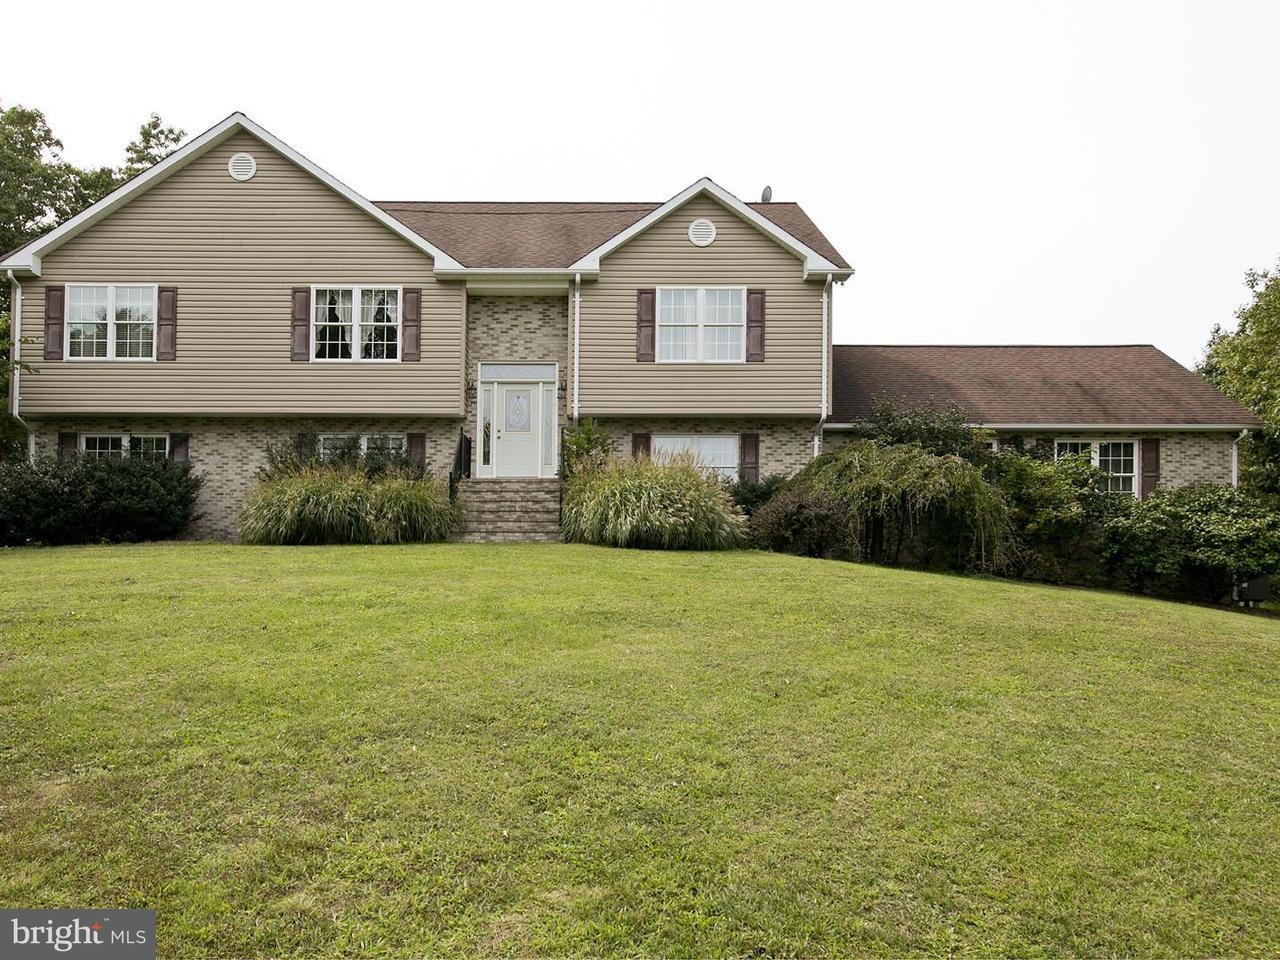 Single Family for Sale at 425 Jackson Dr Capon Bridge, West Virginia 26711 United States